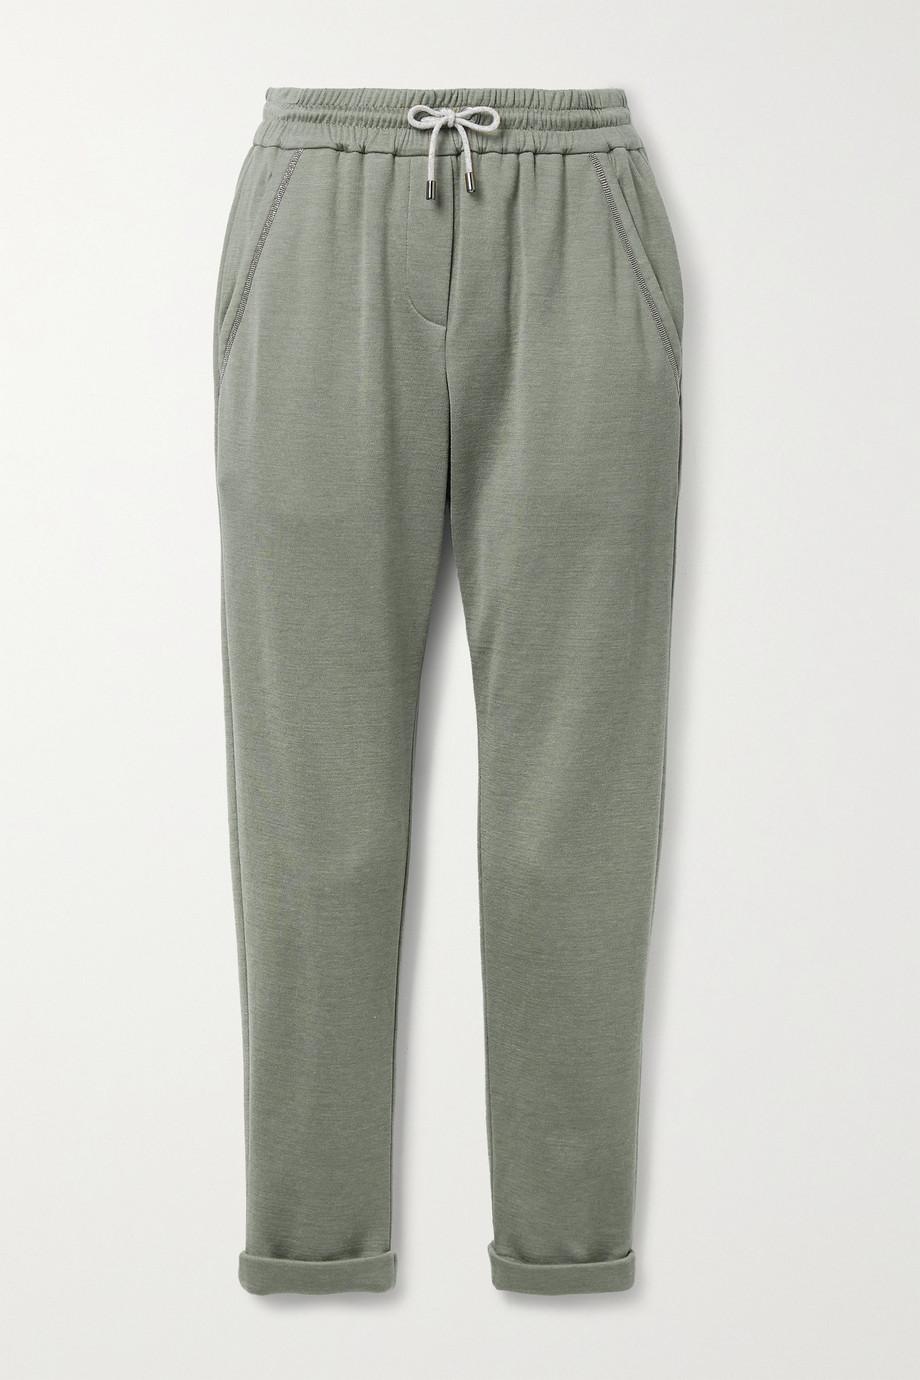 Brunello Cucinelli Bead-embellished cotton-blend jersey track pants